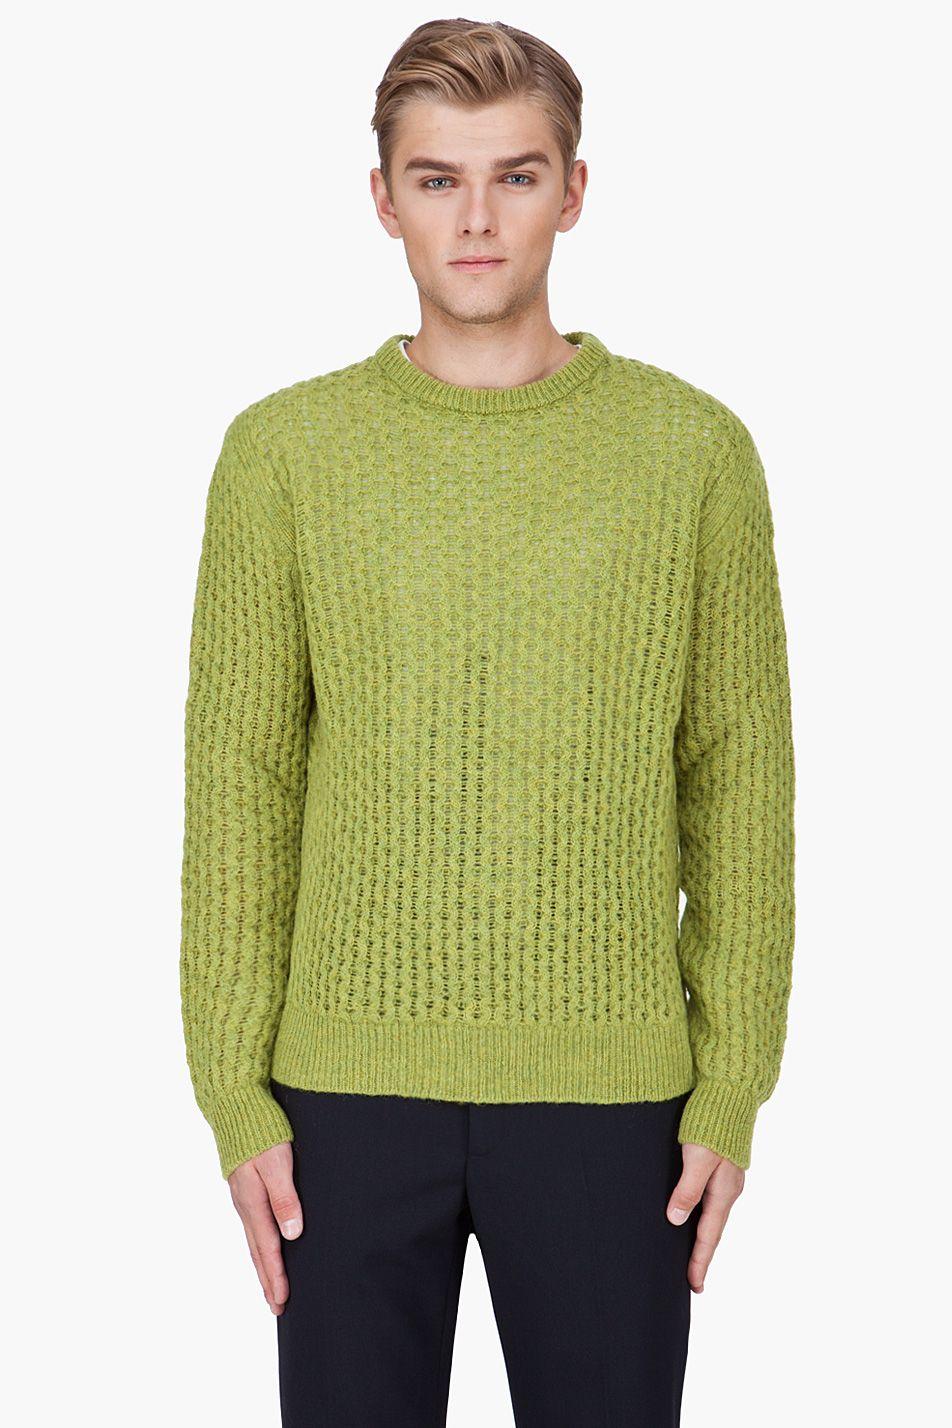 RAF SIMONS Lime Green Wool Knit Sweater | Men's Sweater ...